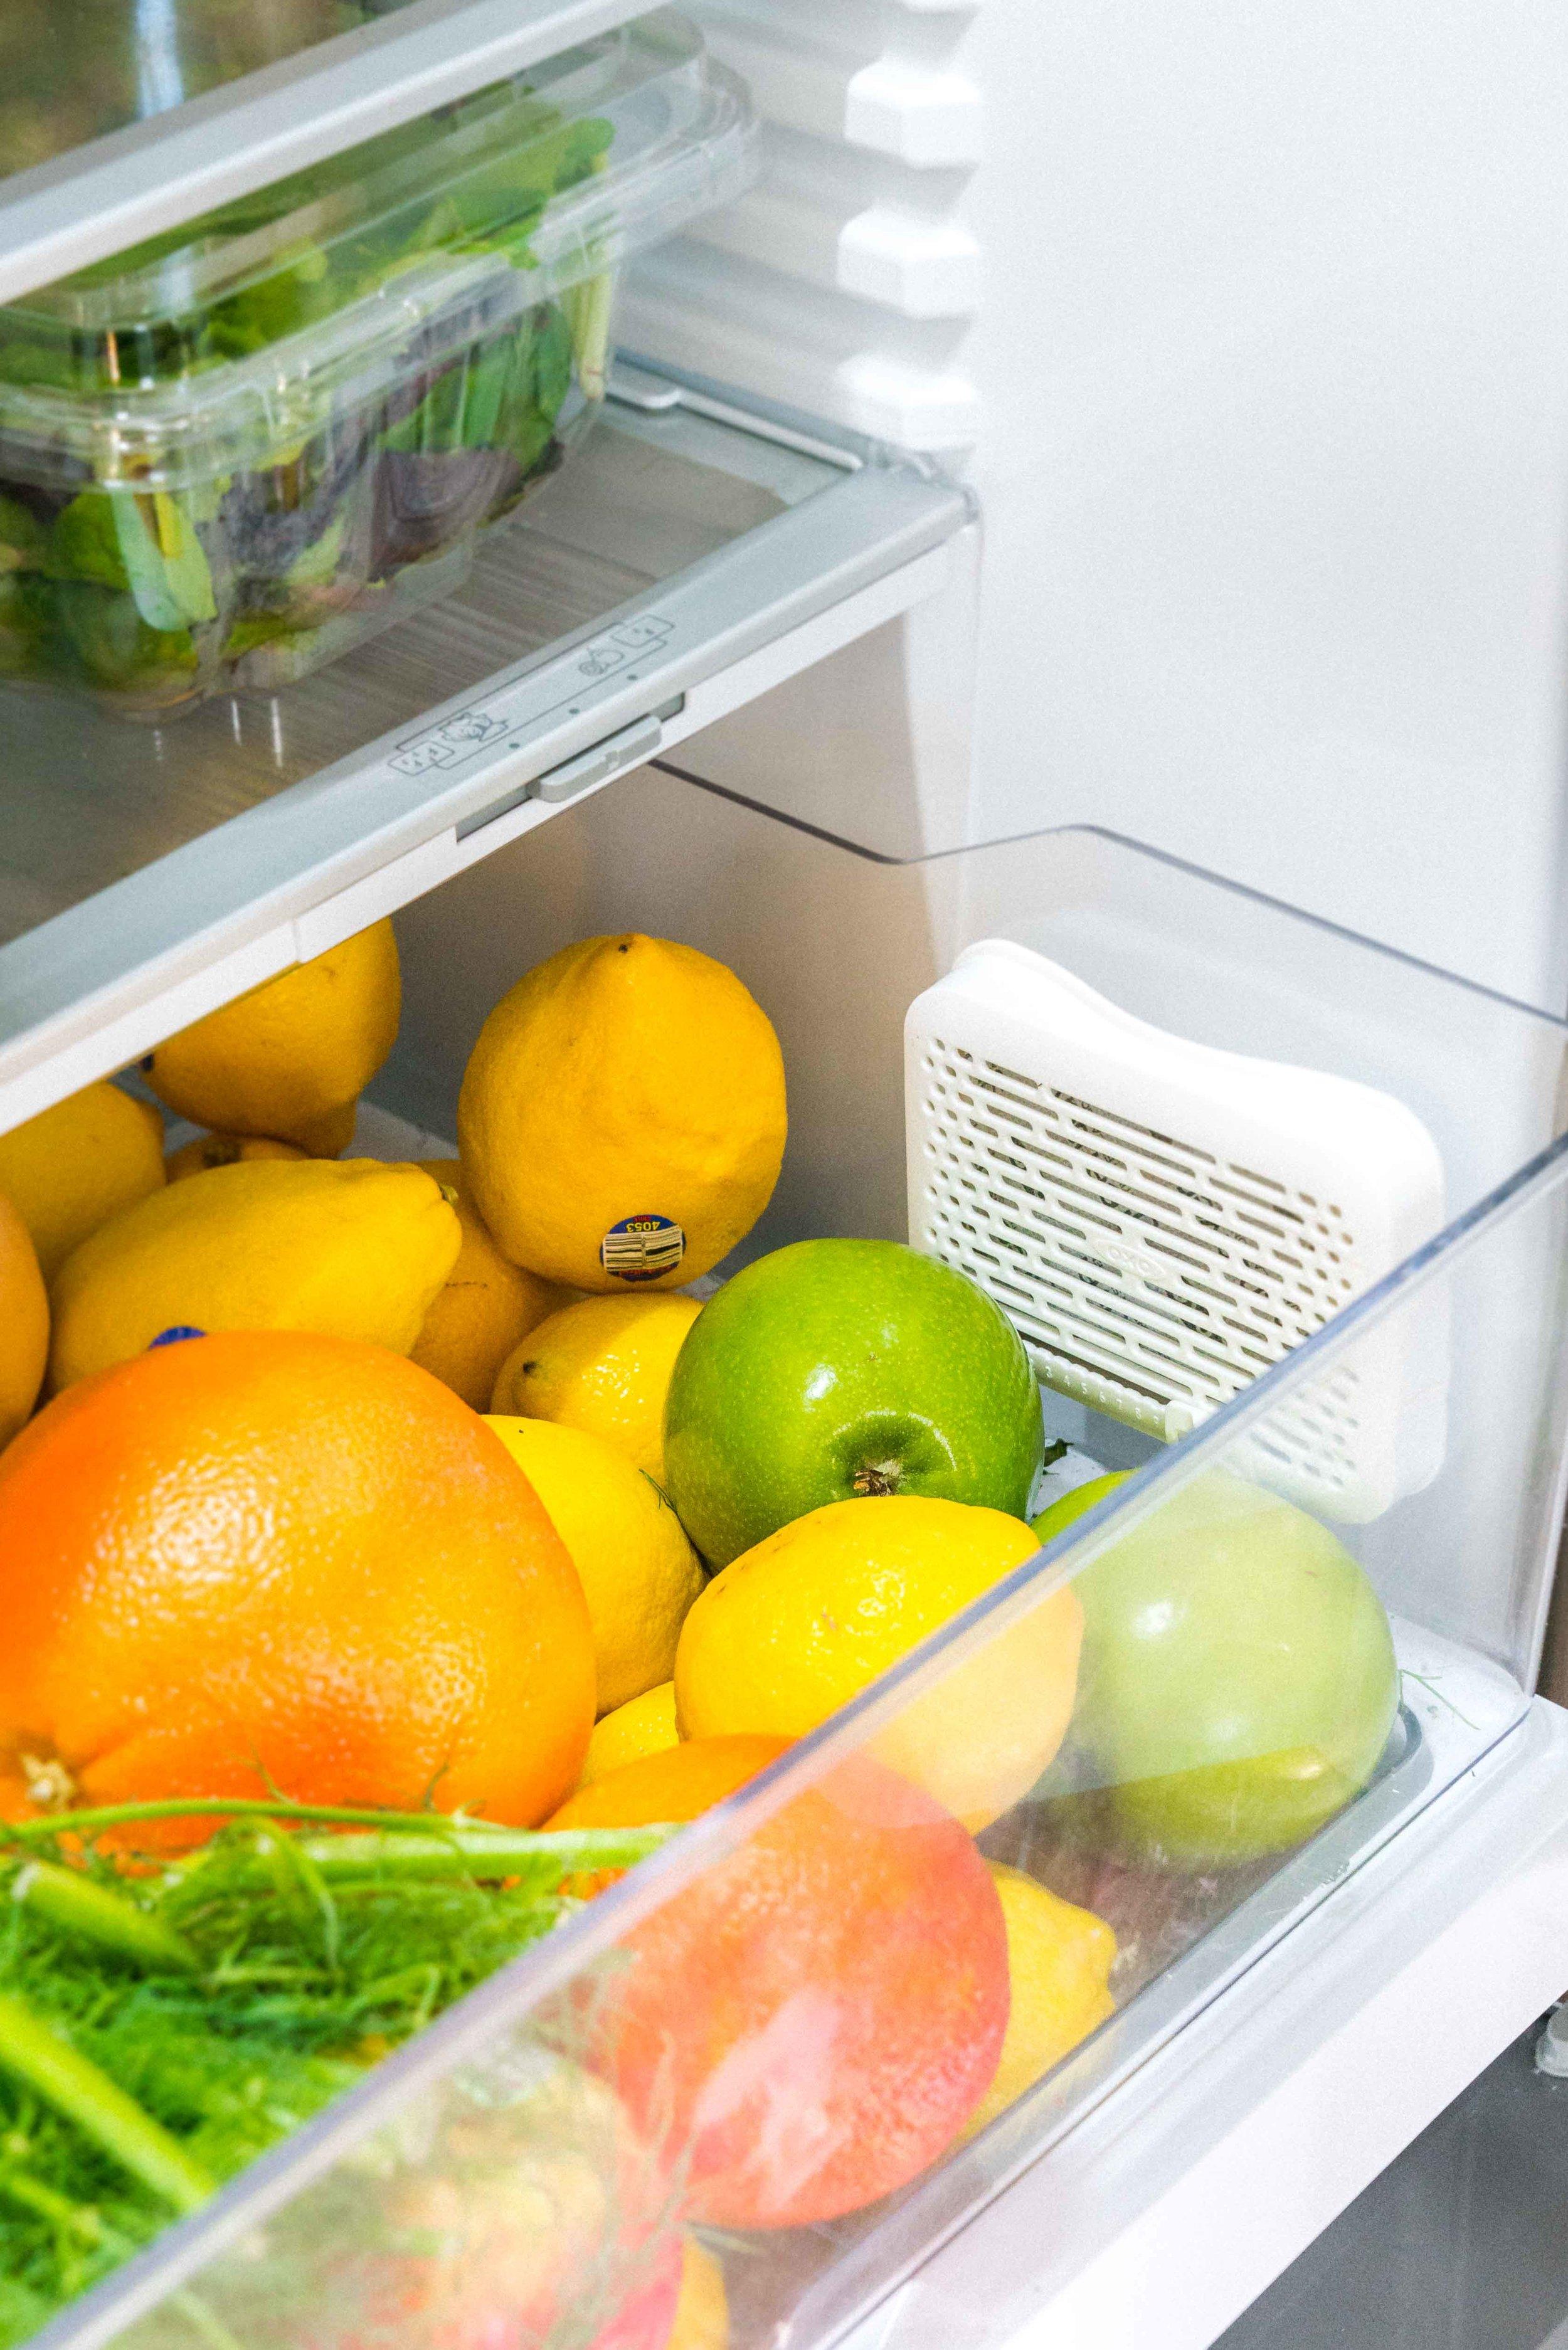 How to Organize Your Fridge to Eat Healthier